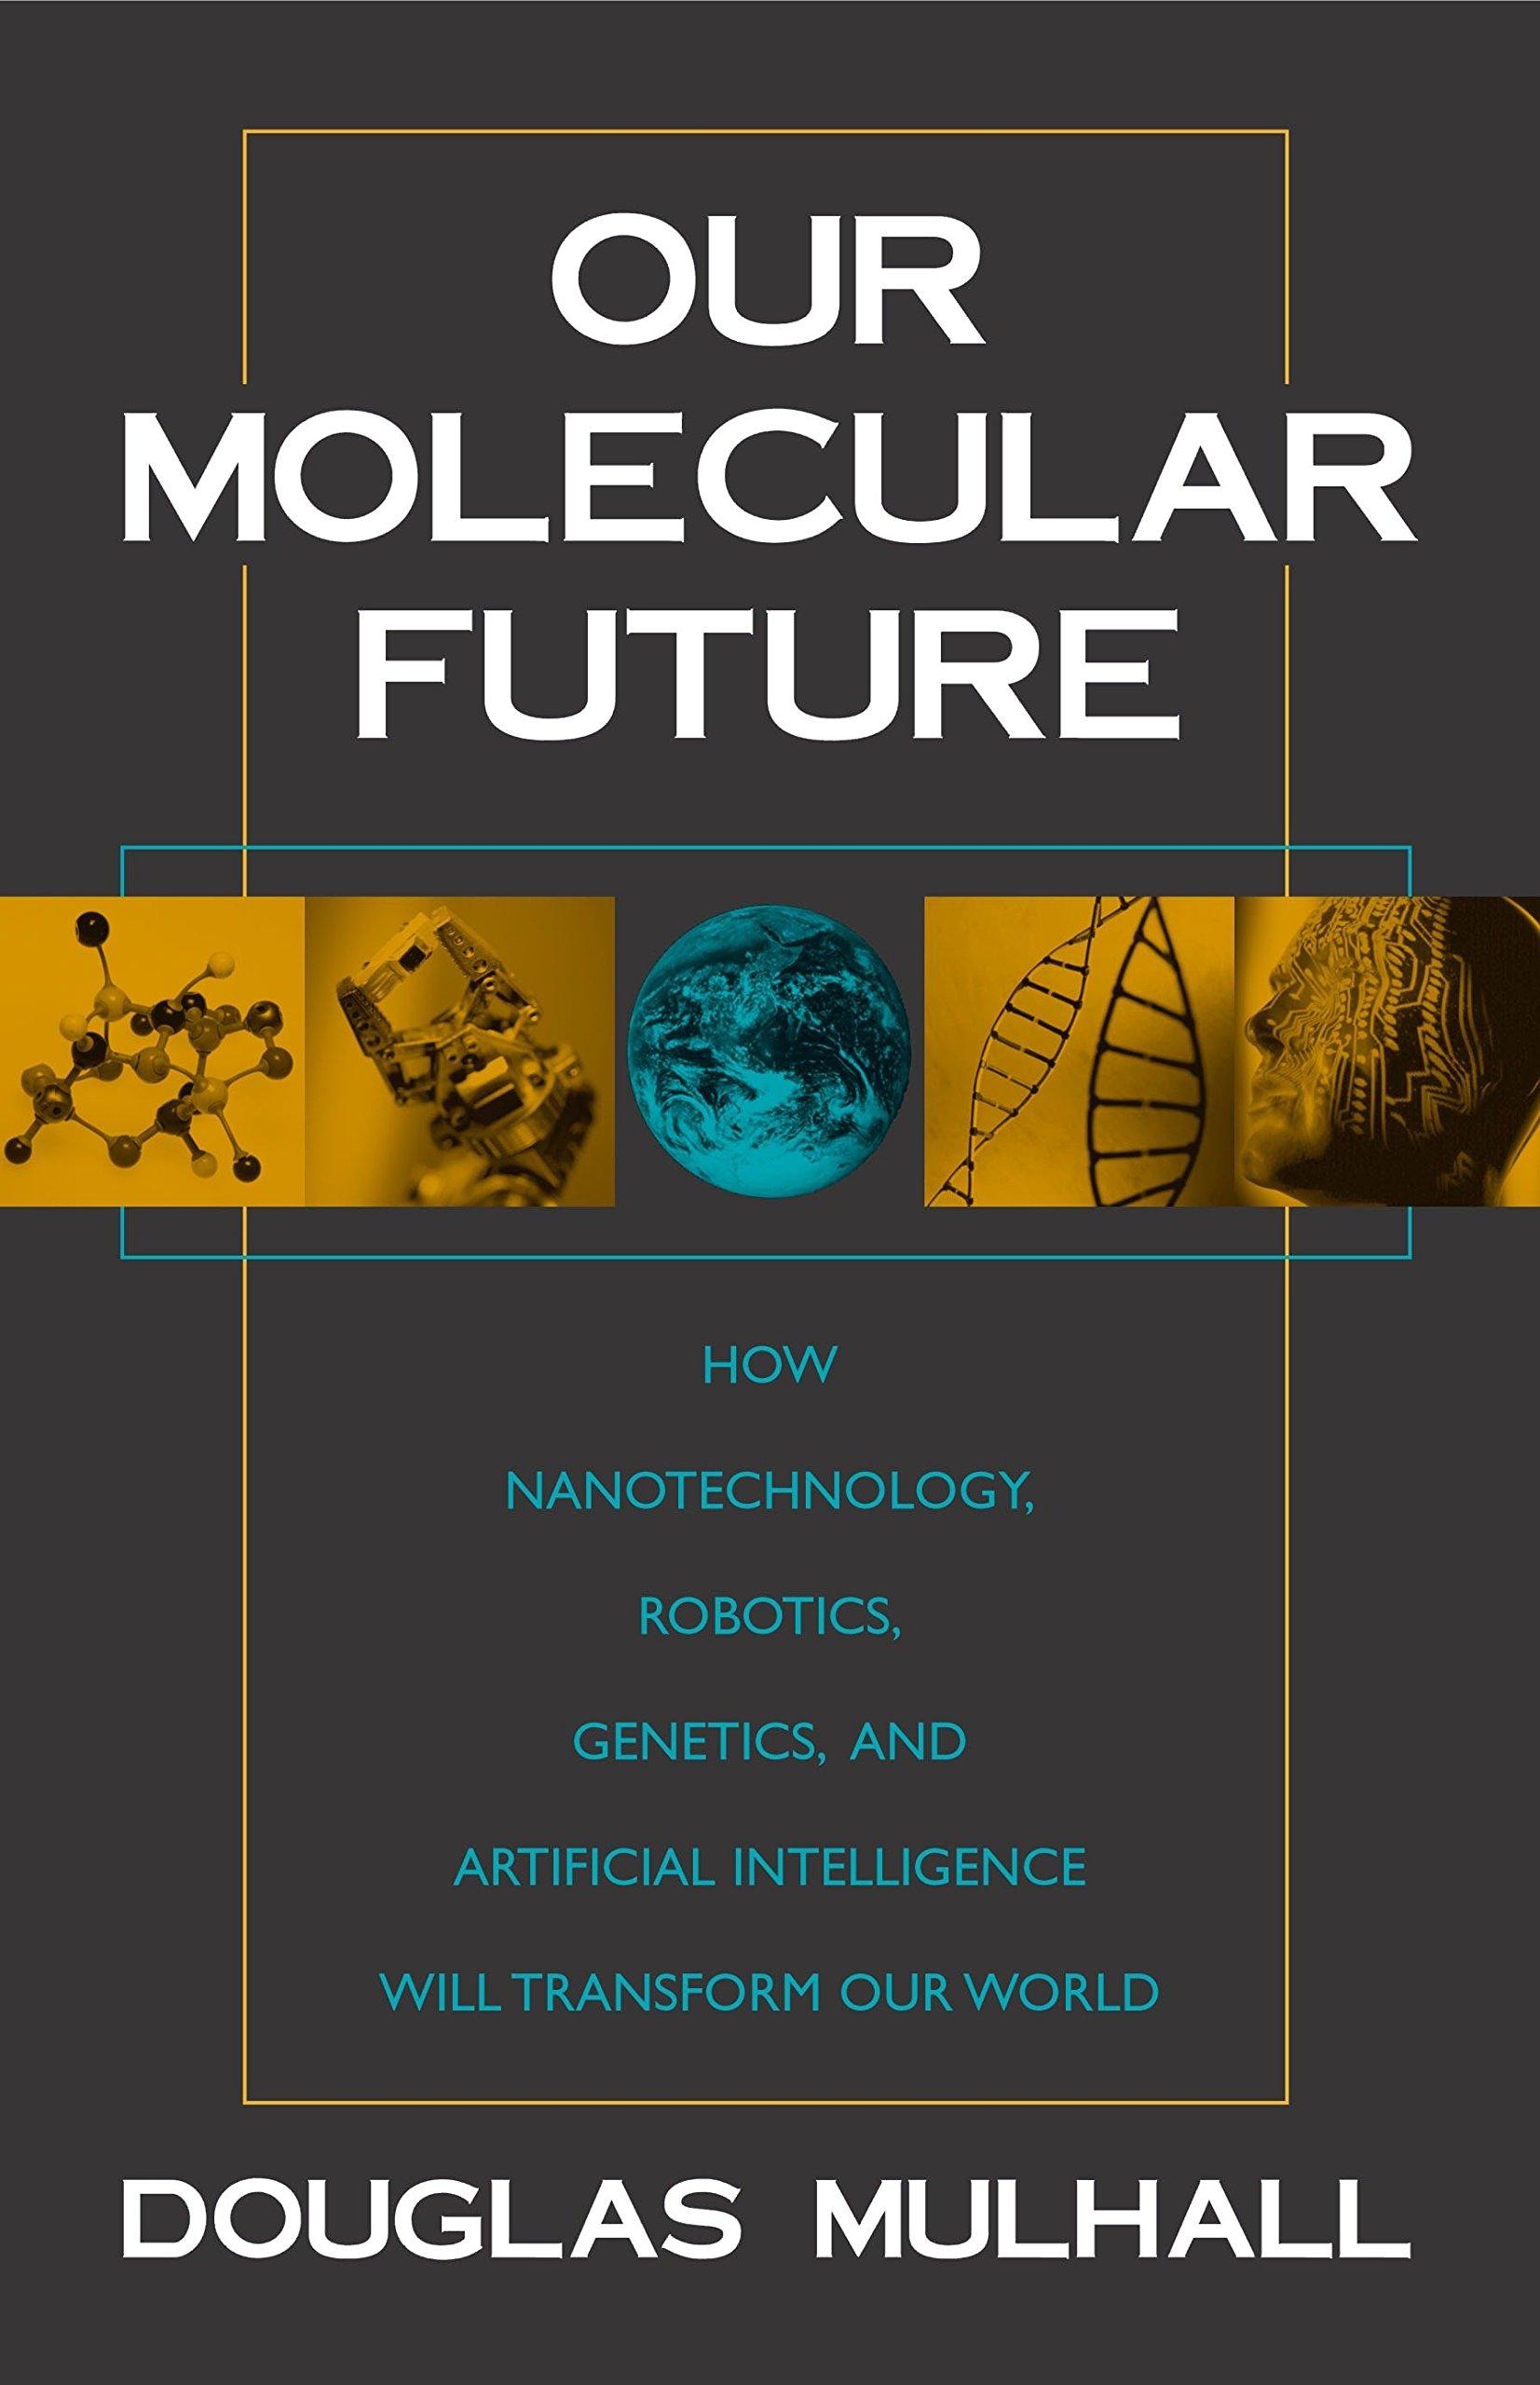 Our Molecular Future: How Nanotechnology, Robotics, Genetics